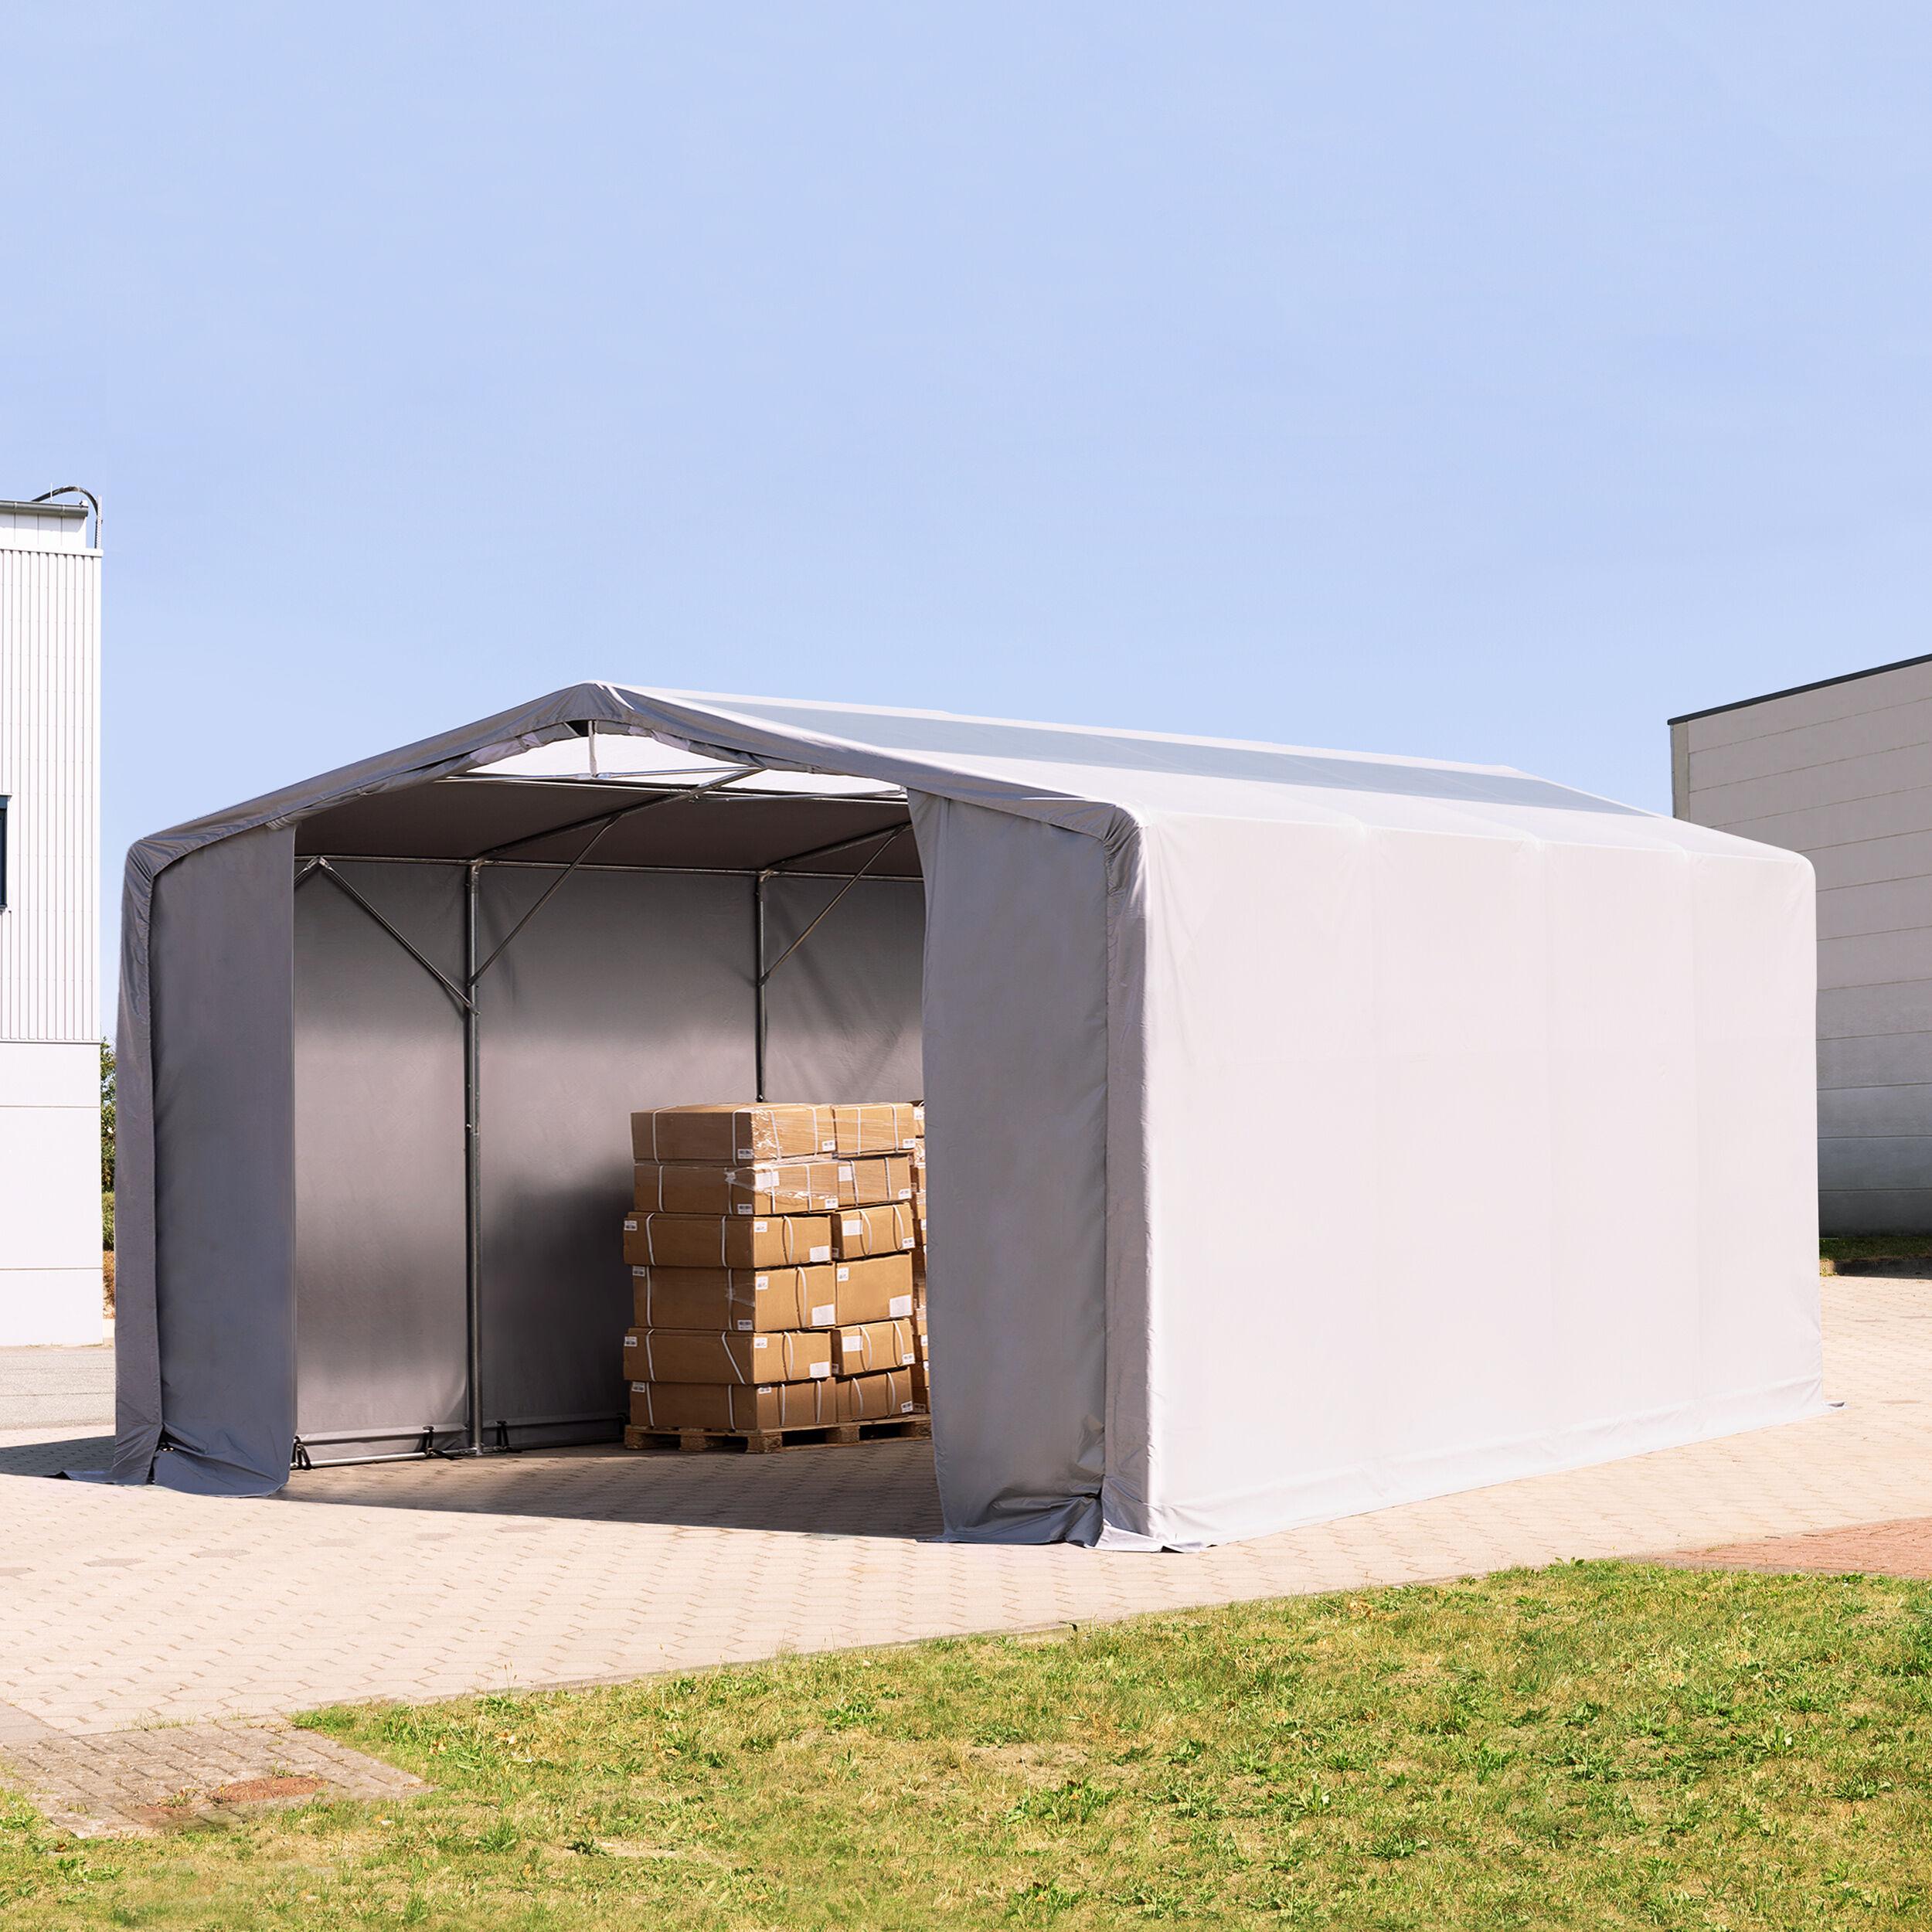 TOOLPORT Industrial Tent 8x8m PVC 550 g/m² grey waterproof